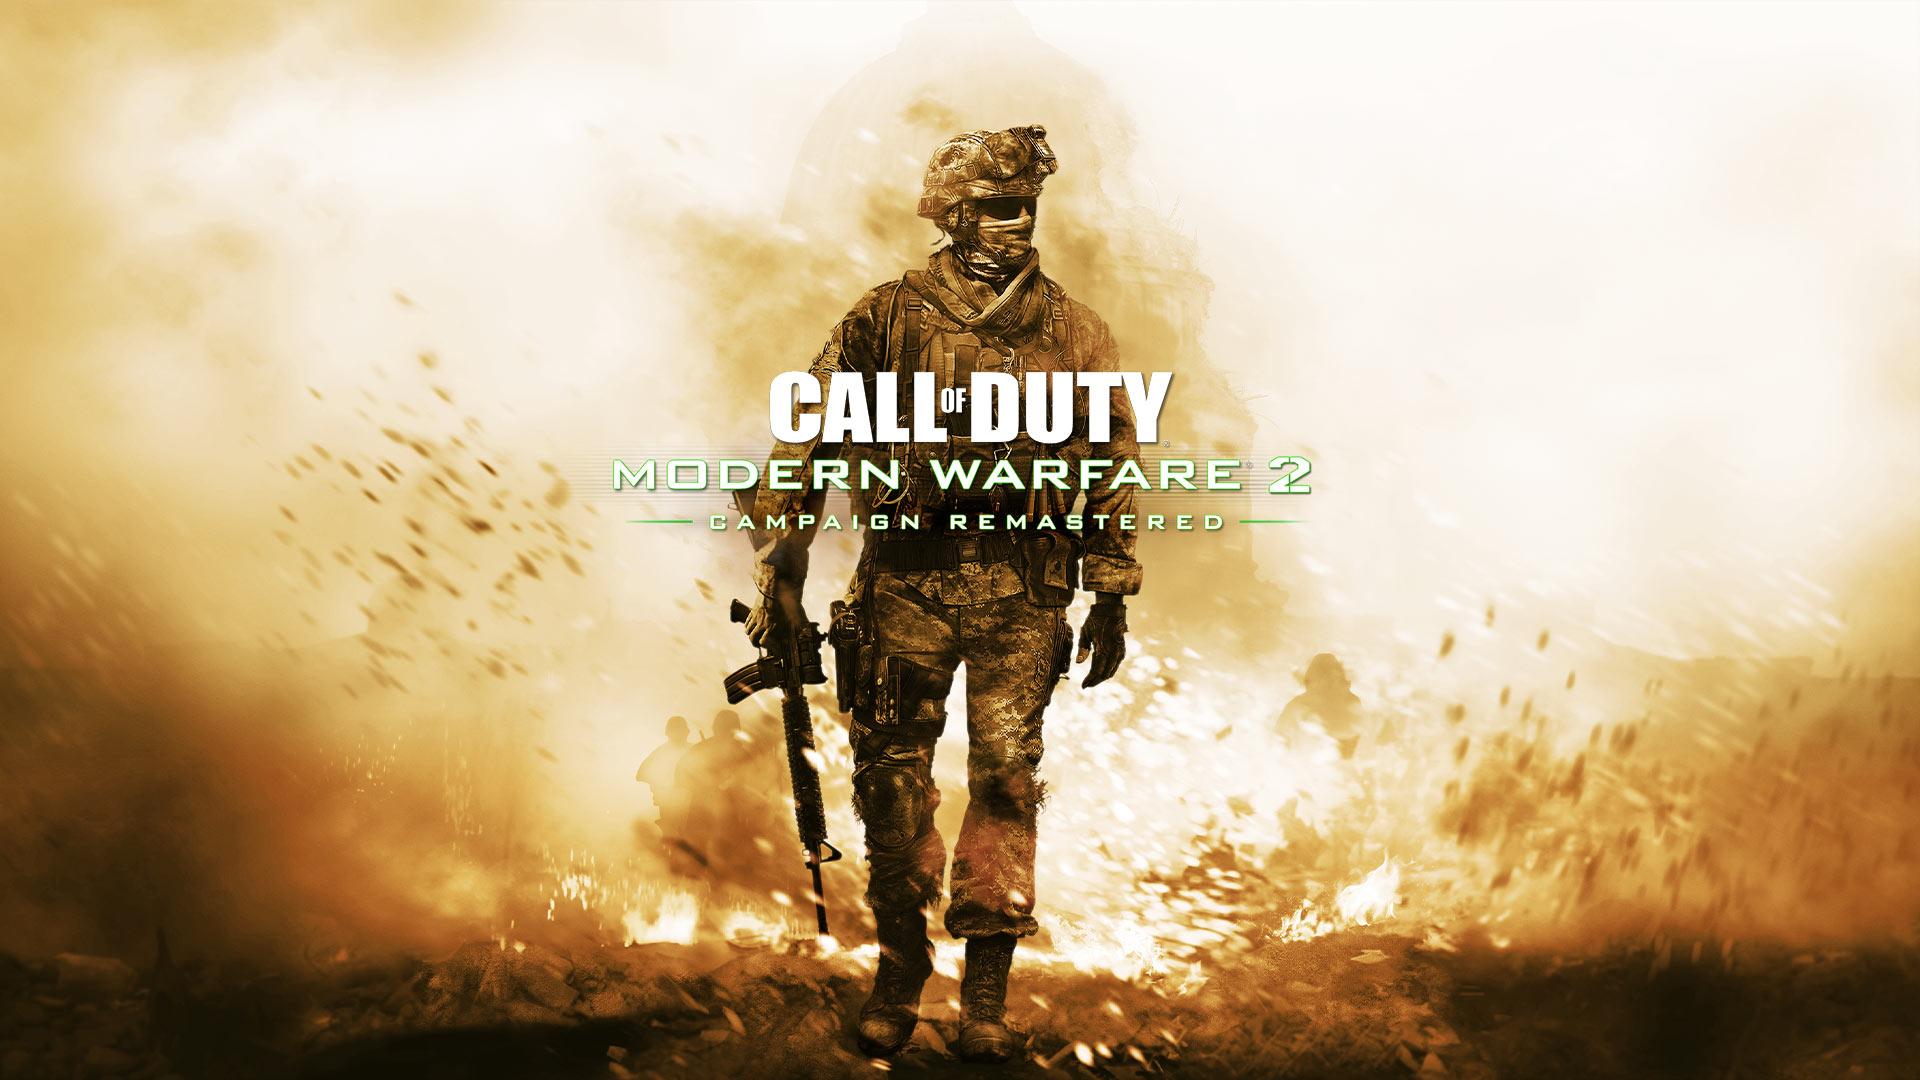 To nie żart! Call of Duty: Modern Warfare 2 Campaign Remastered już dostępne 22